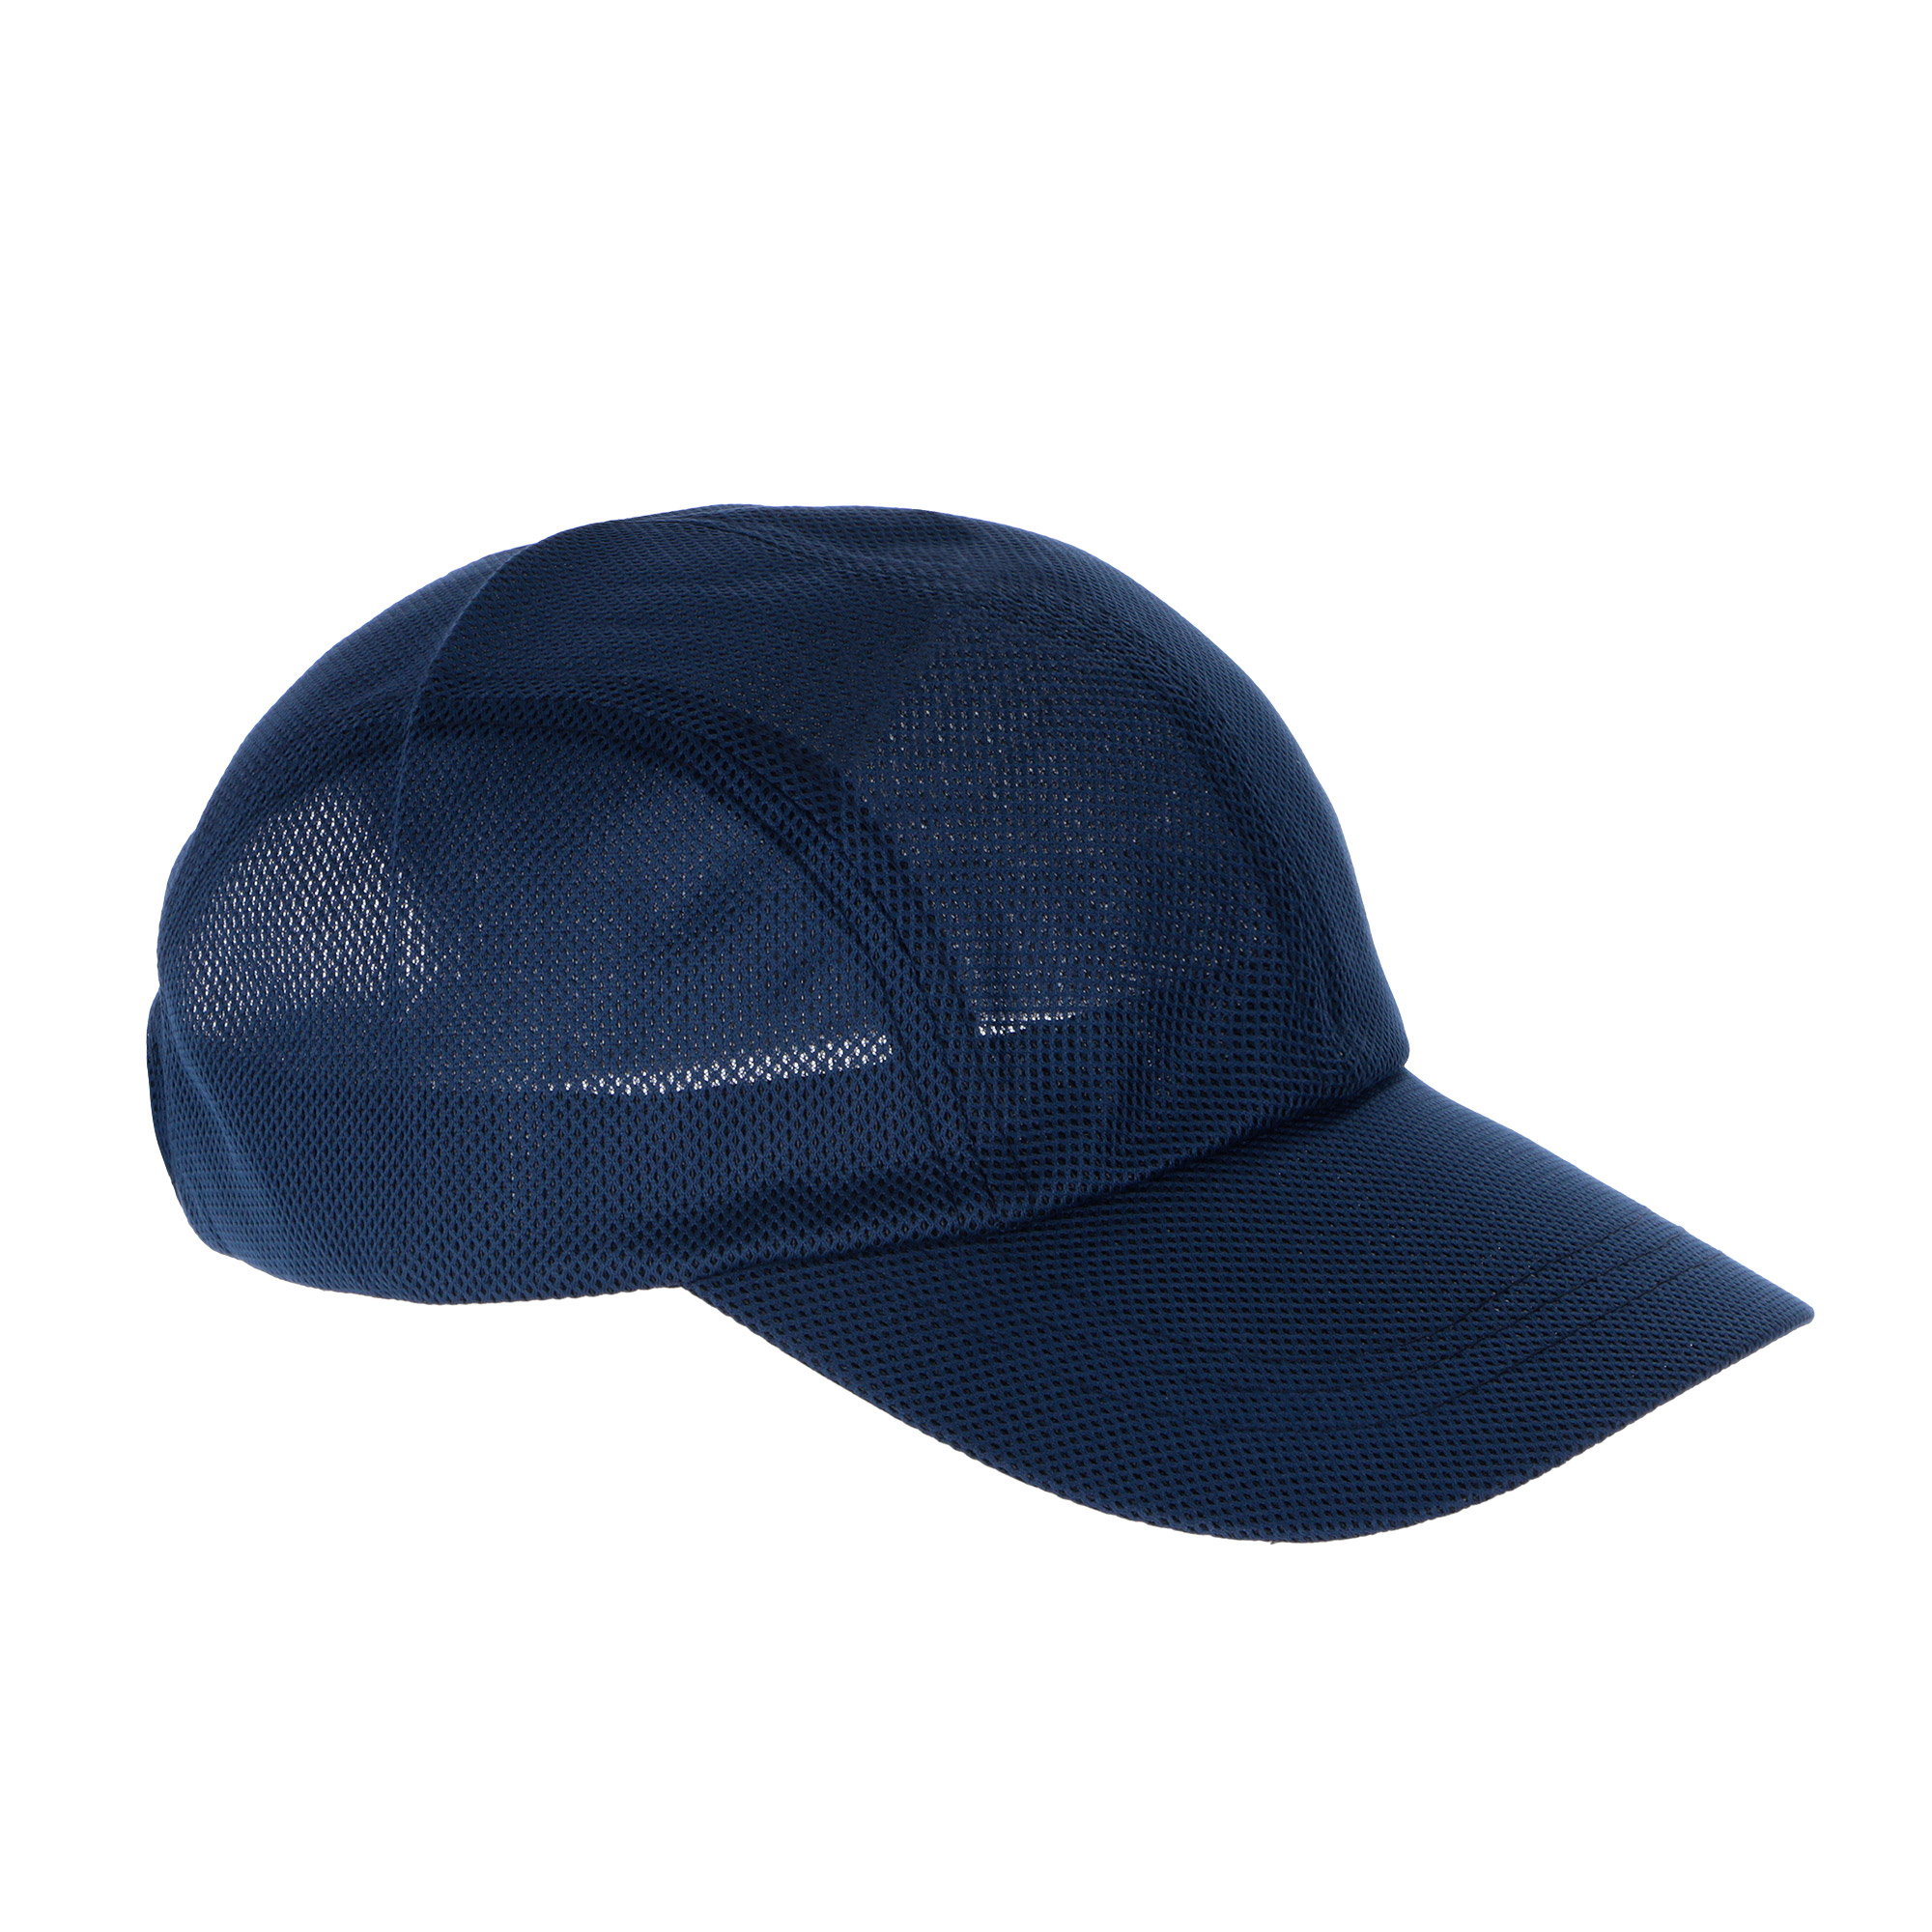 Бейсболка с сеткой Zhejiang Yining синяя 58 см